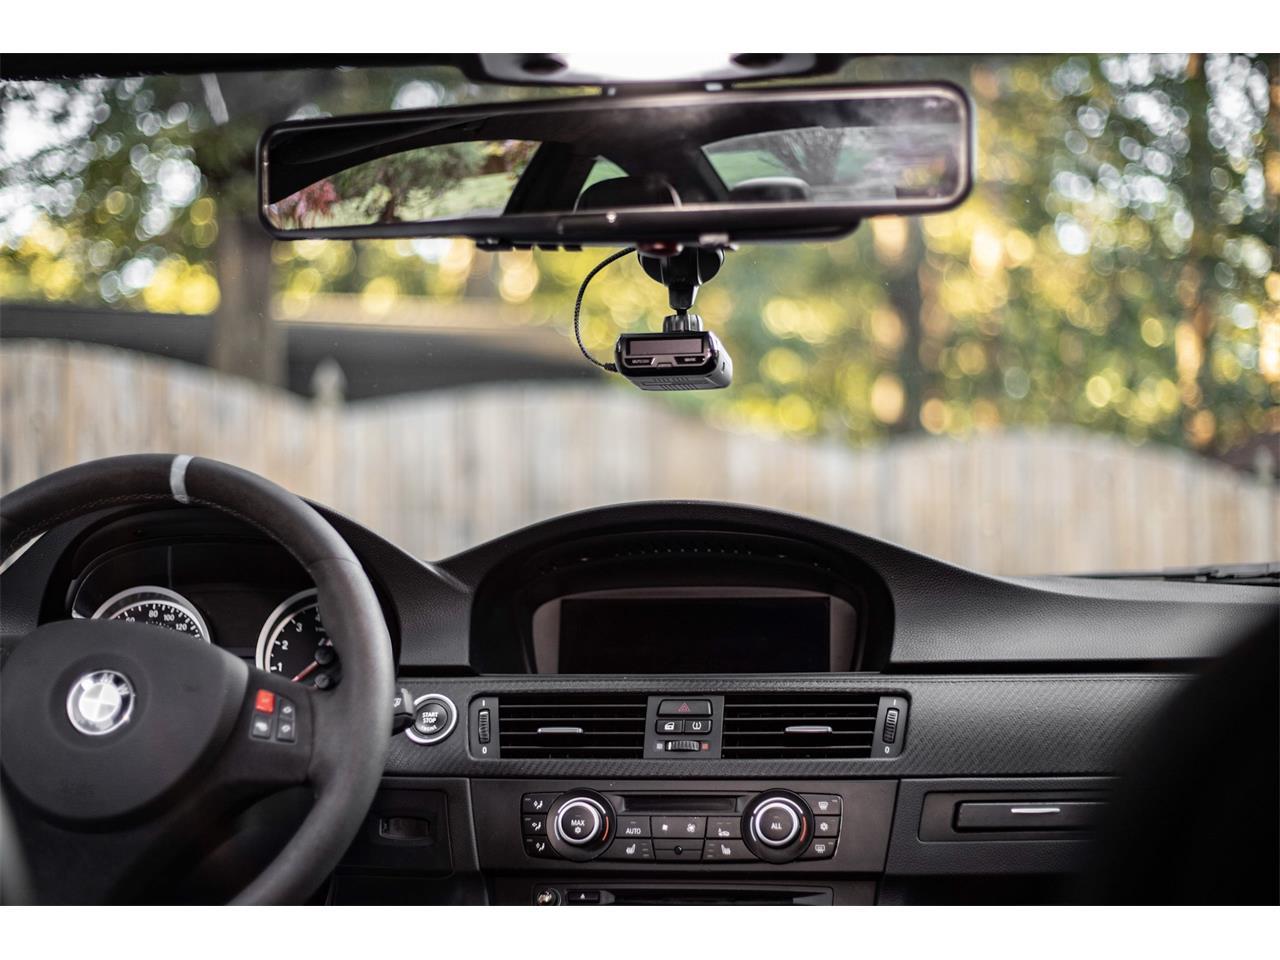 2011 BMW M3 (CC-1256486) for sale in Kernersville, North Carolina